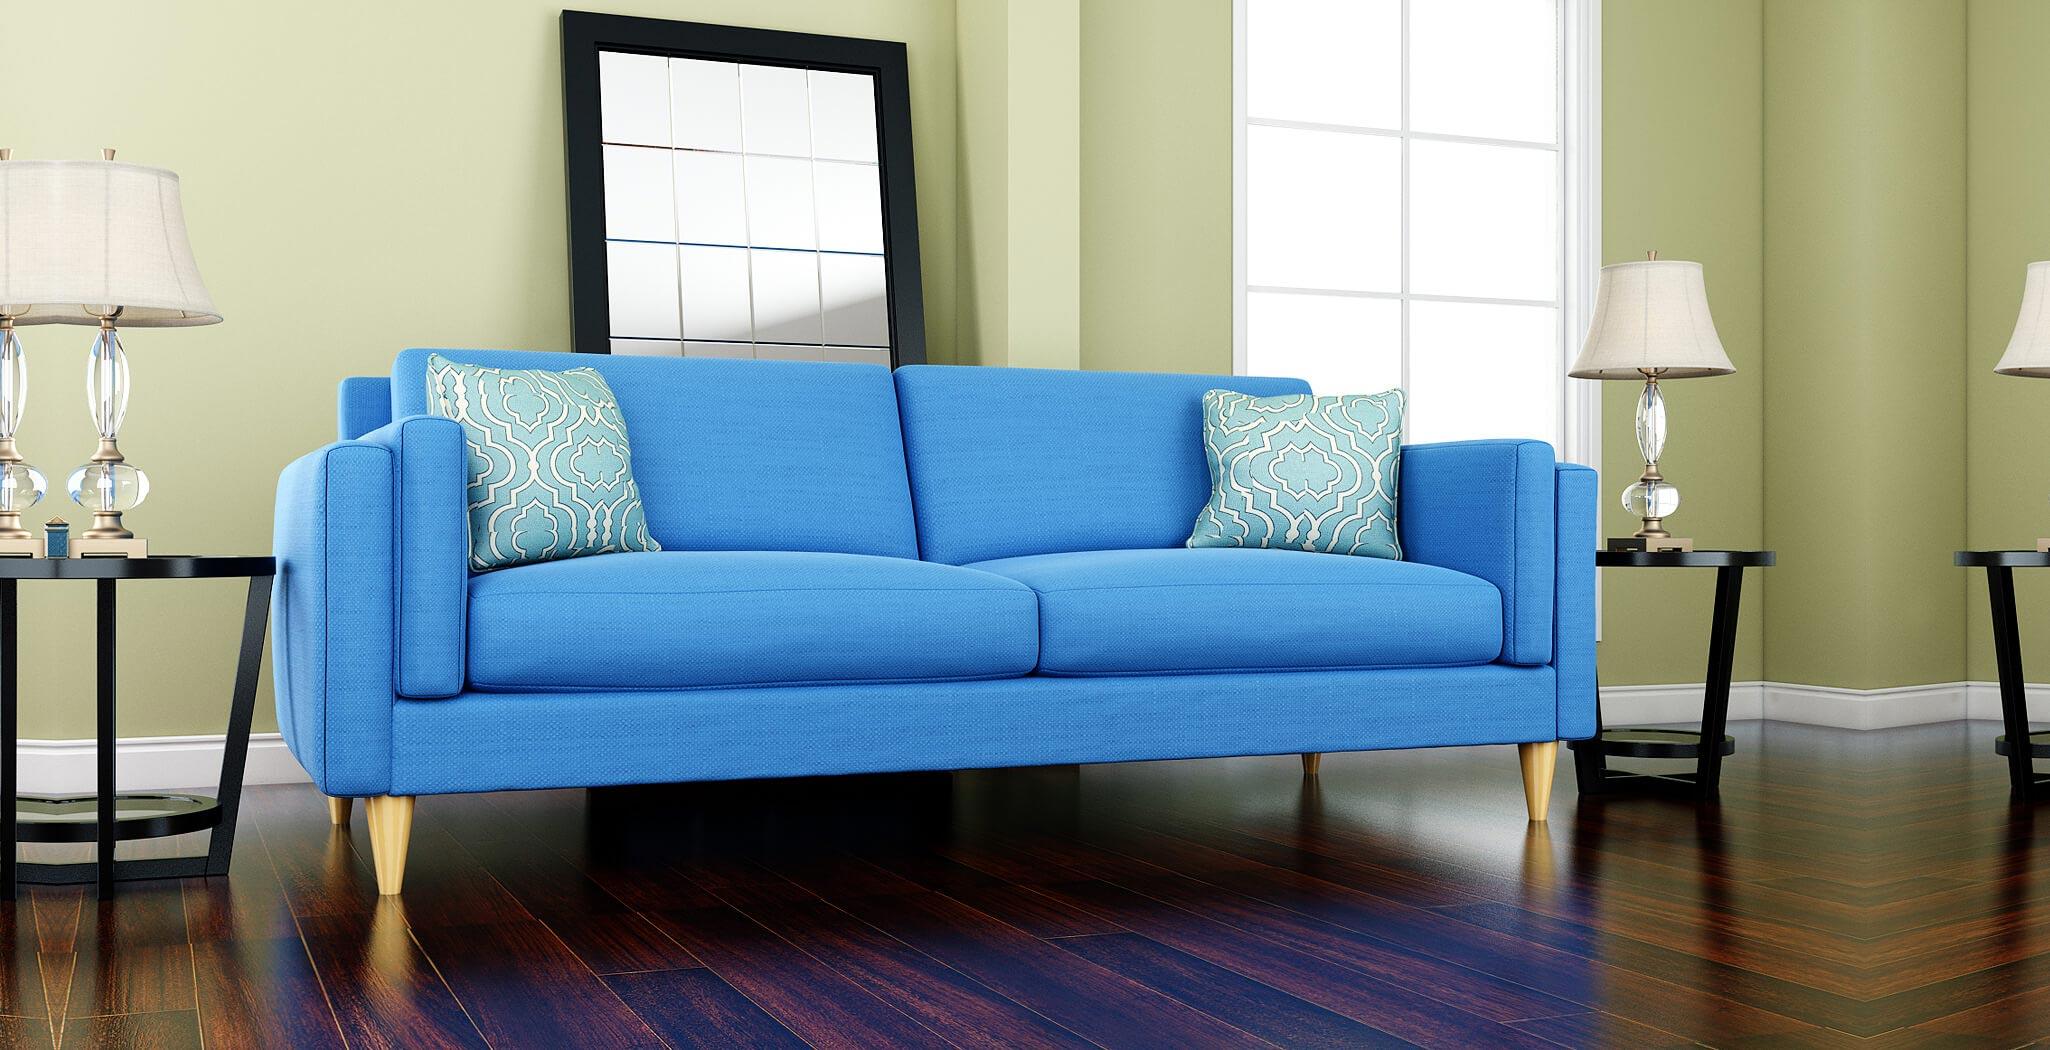 helsinki sofa furniture gallery 2